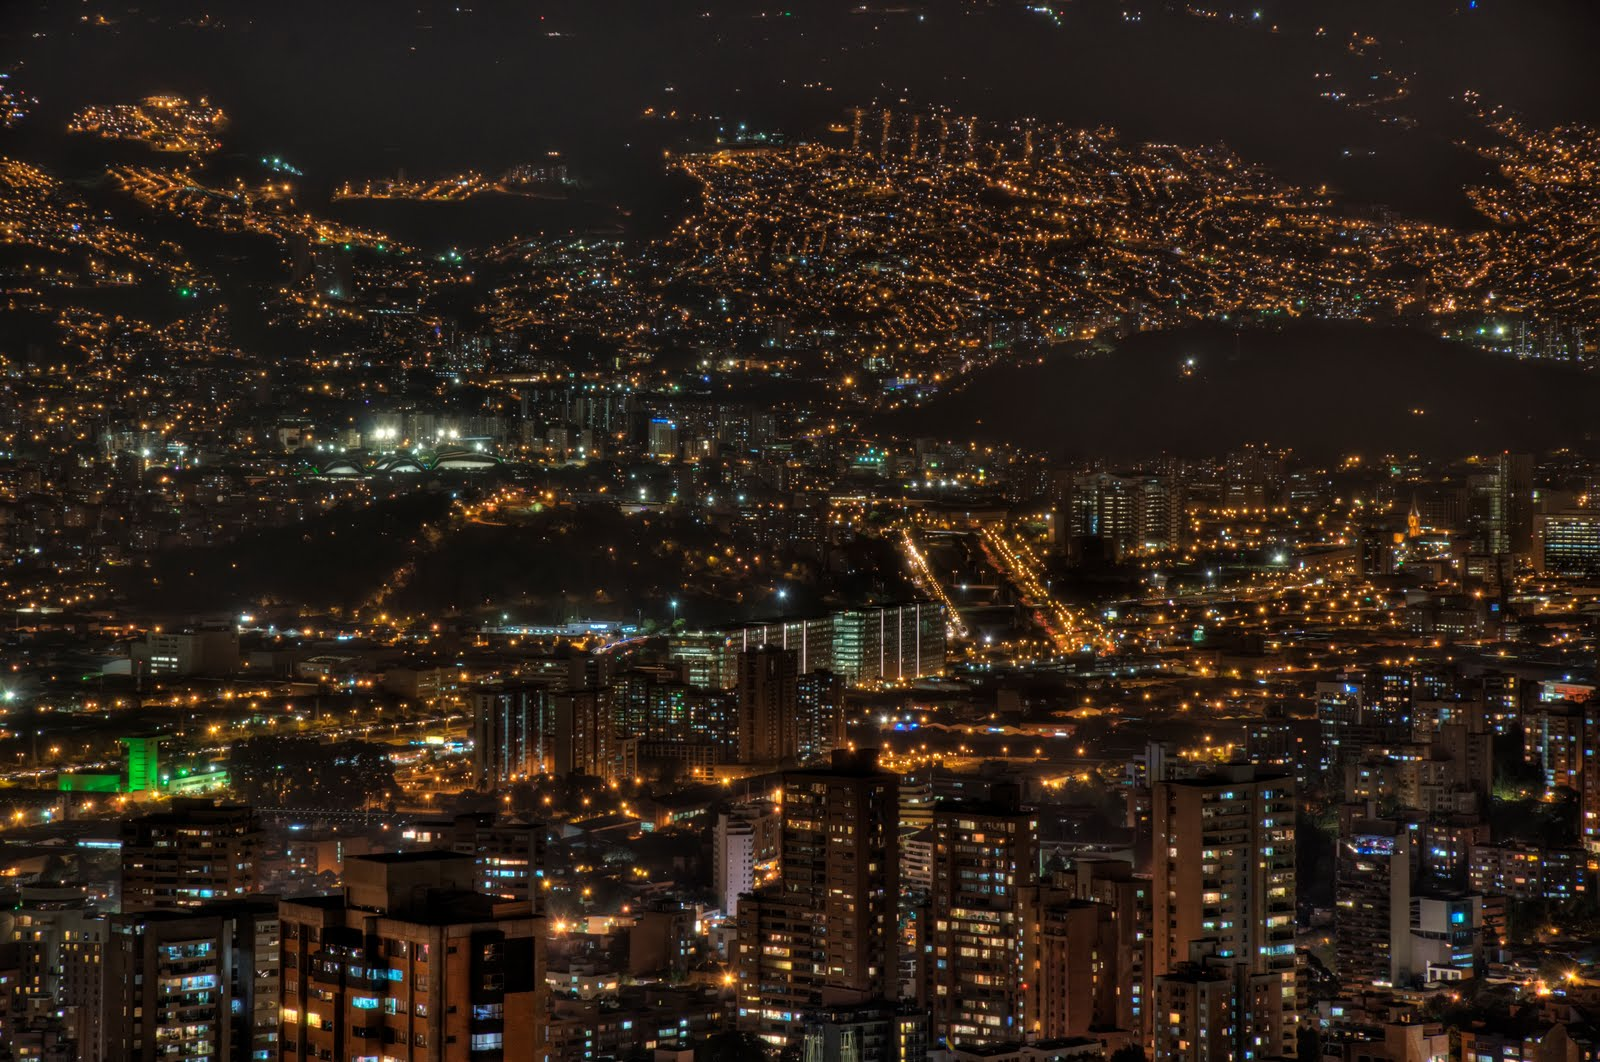 Chase Juan Jaramillo Medellin At Night